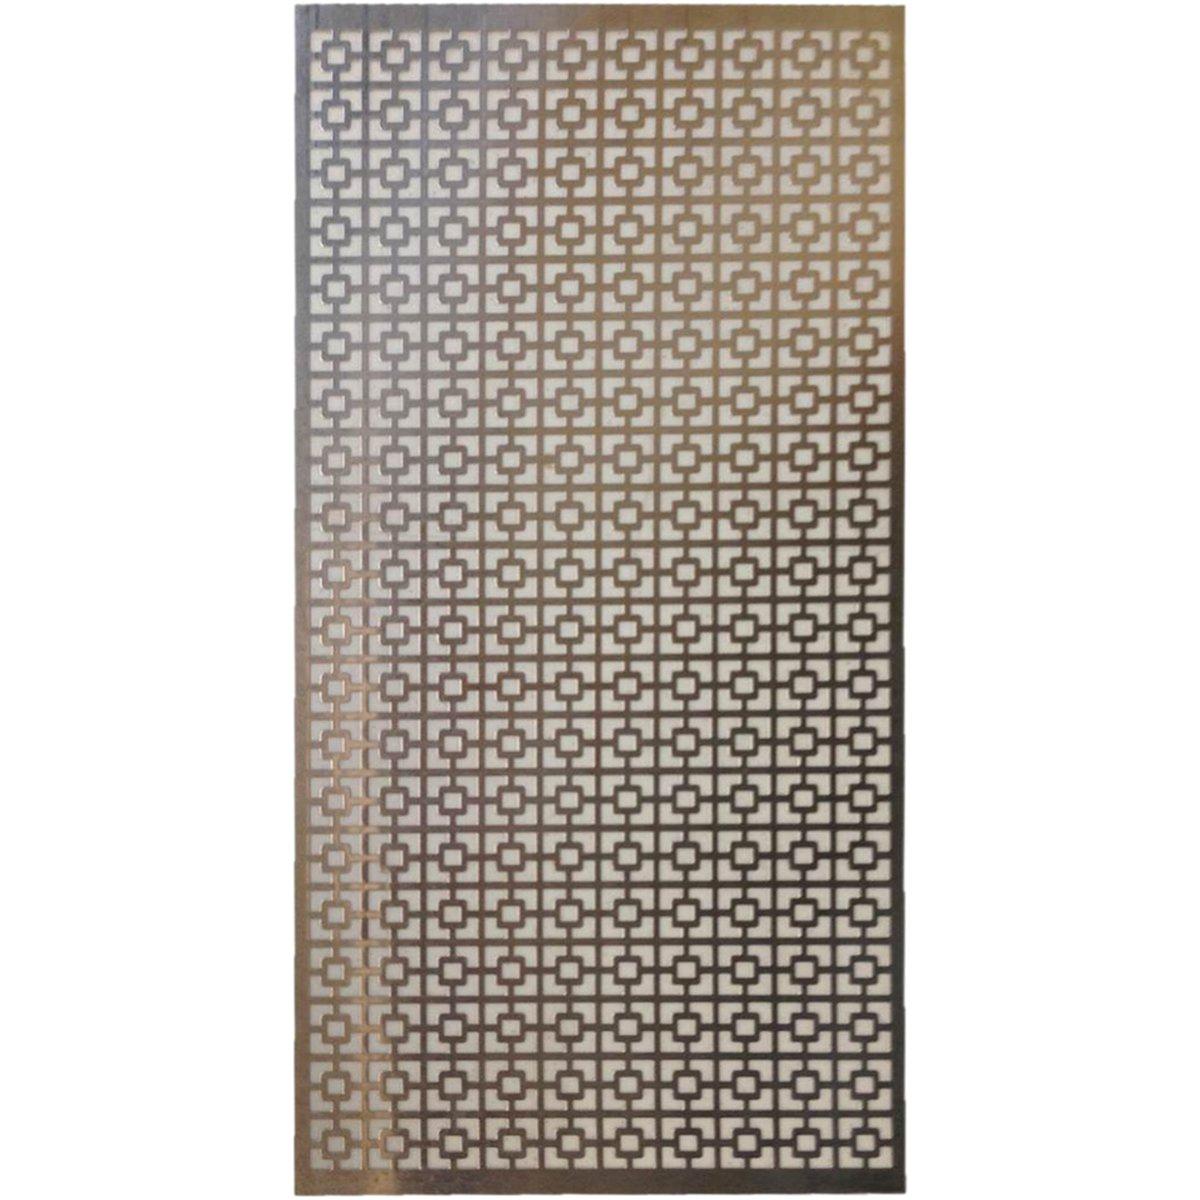 M-D Hobby & Craft 57-540 Aluminum Metal Sheet, 12' by 24', Chain Link